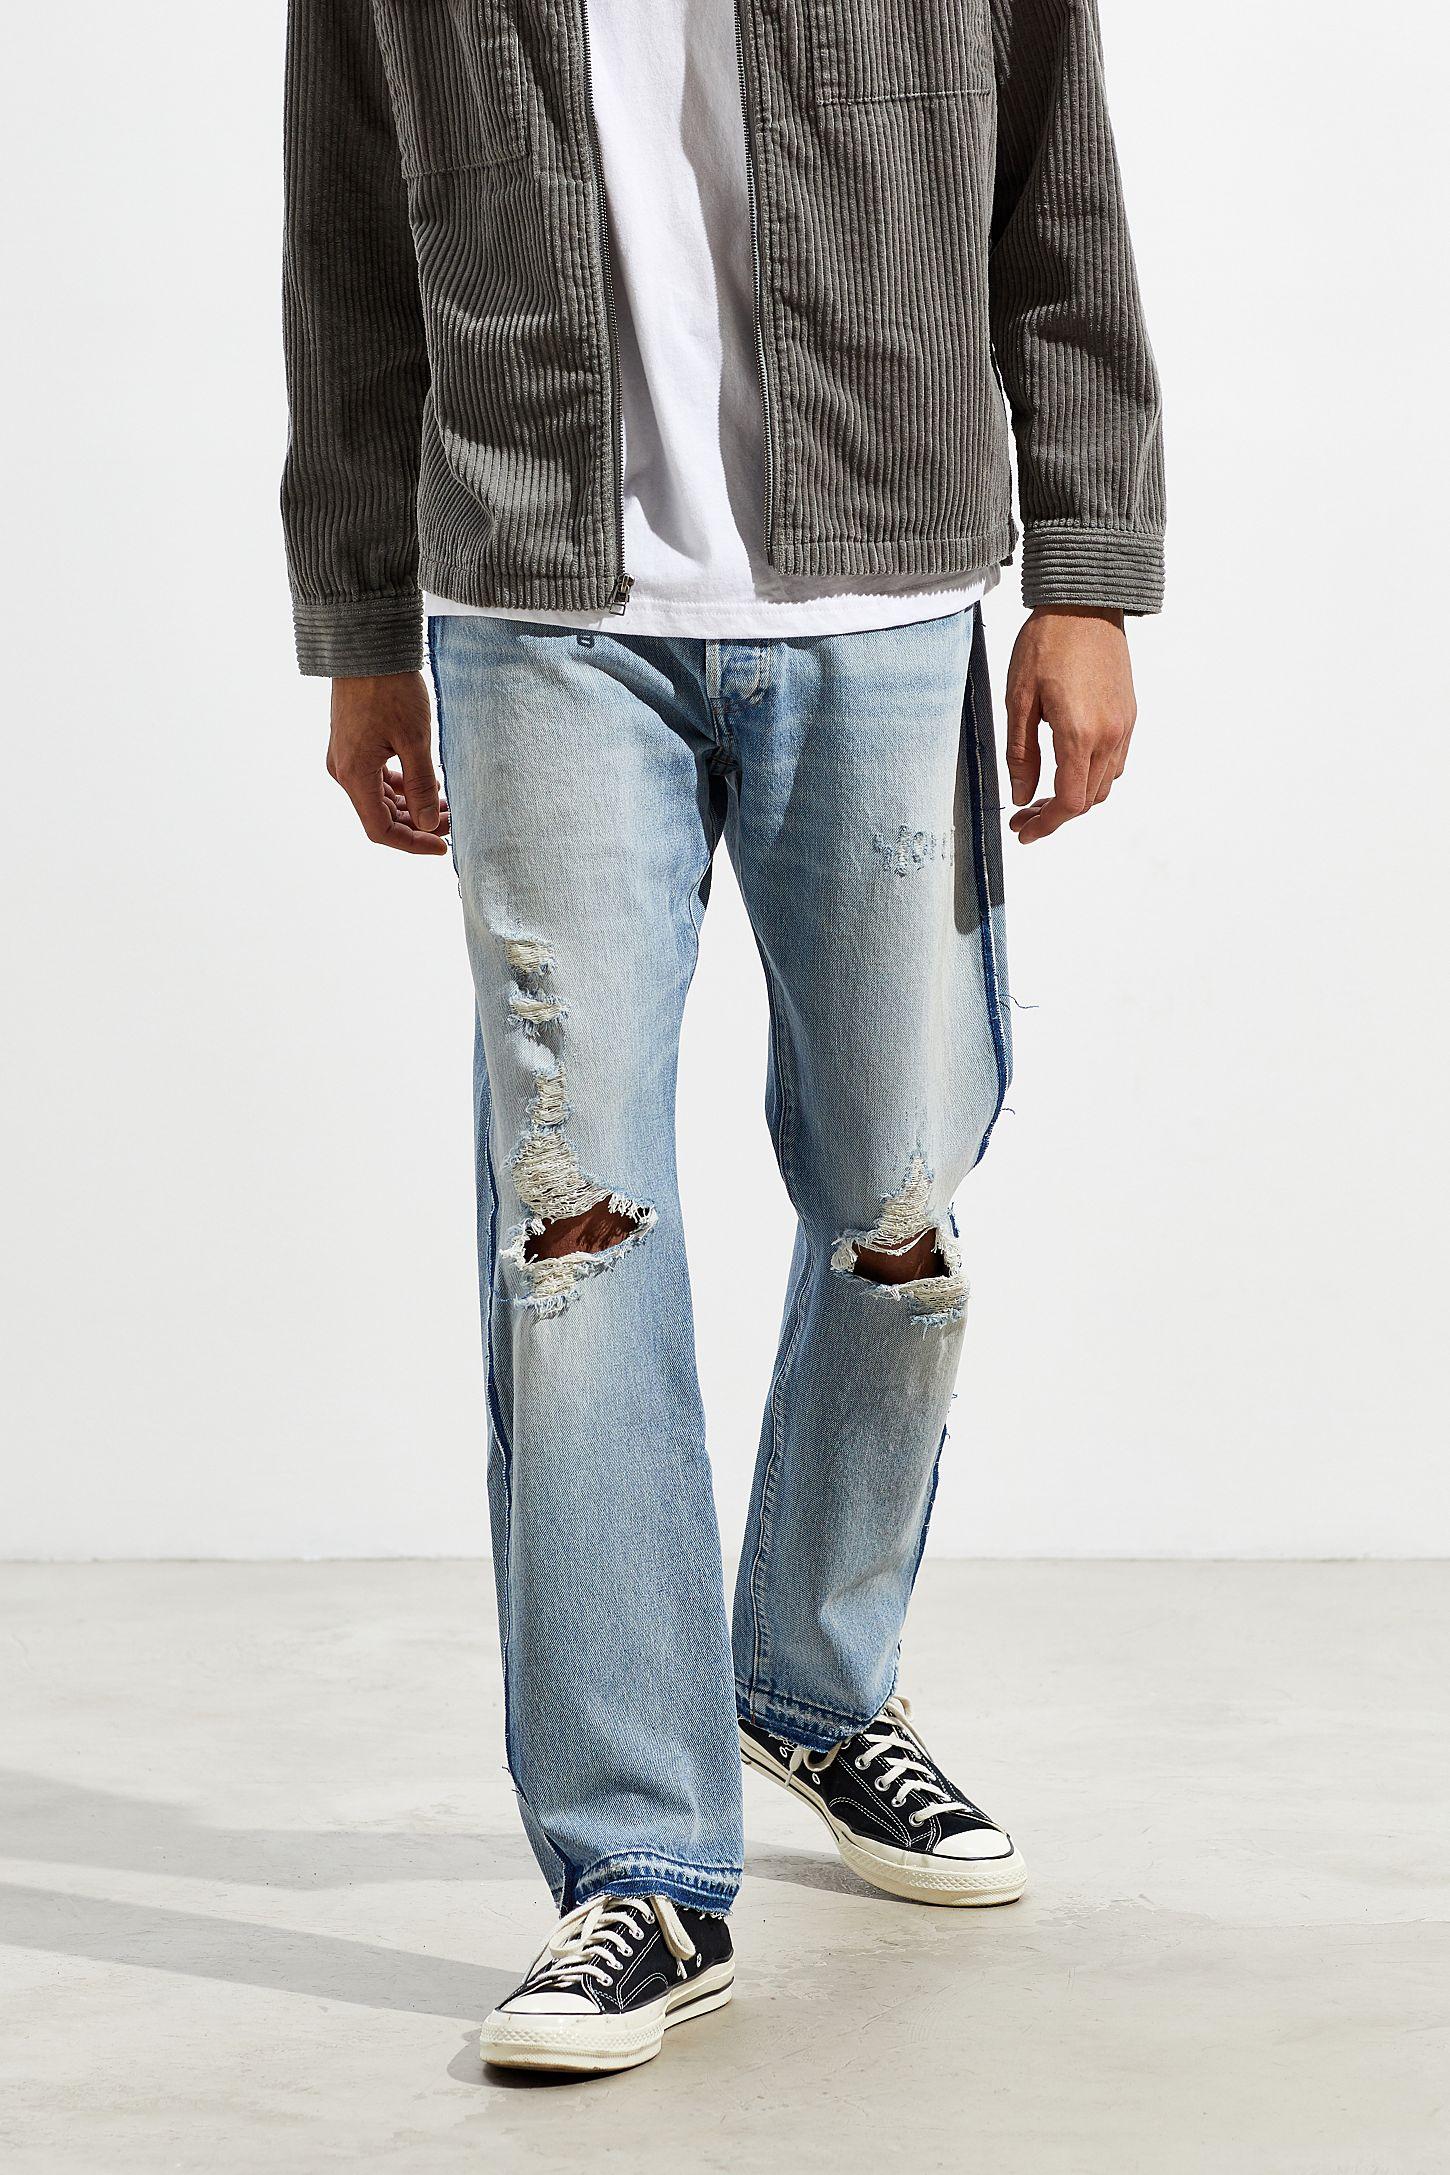 price reduced performance sportswear best wholesaler Levi's 501 Inside Out Slim Jean